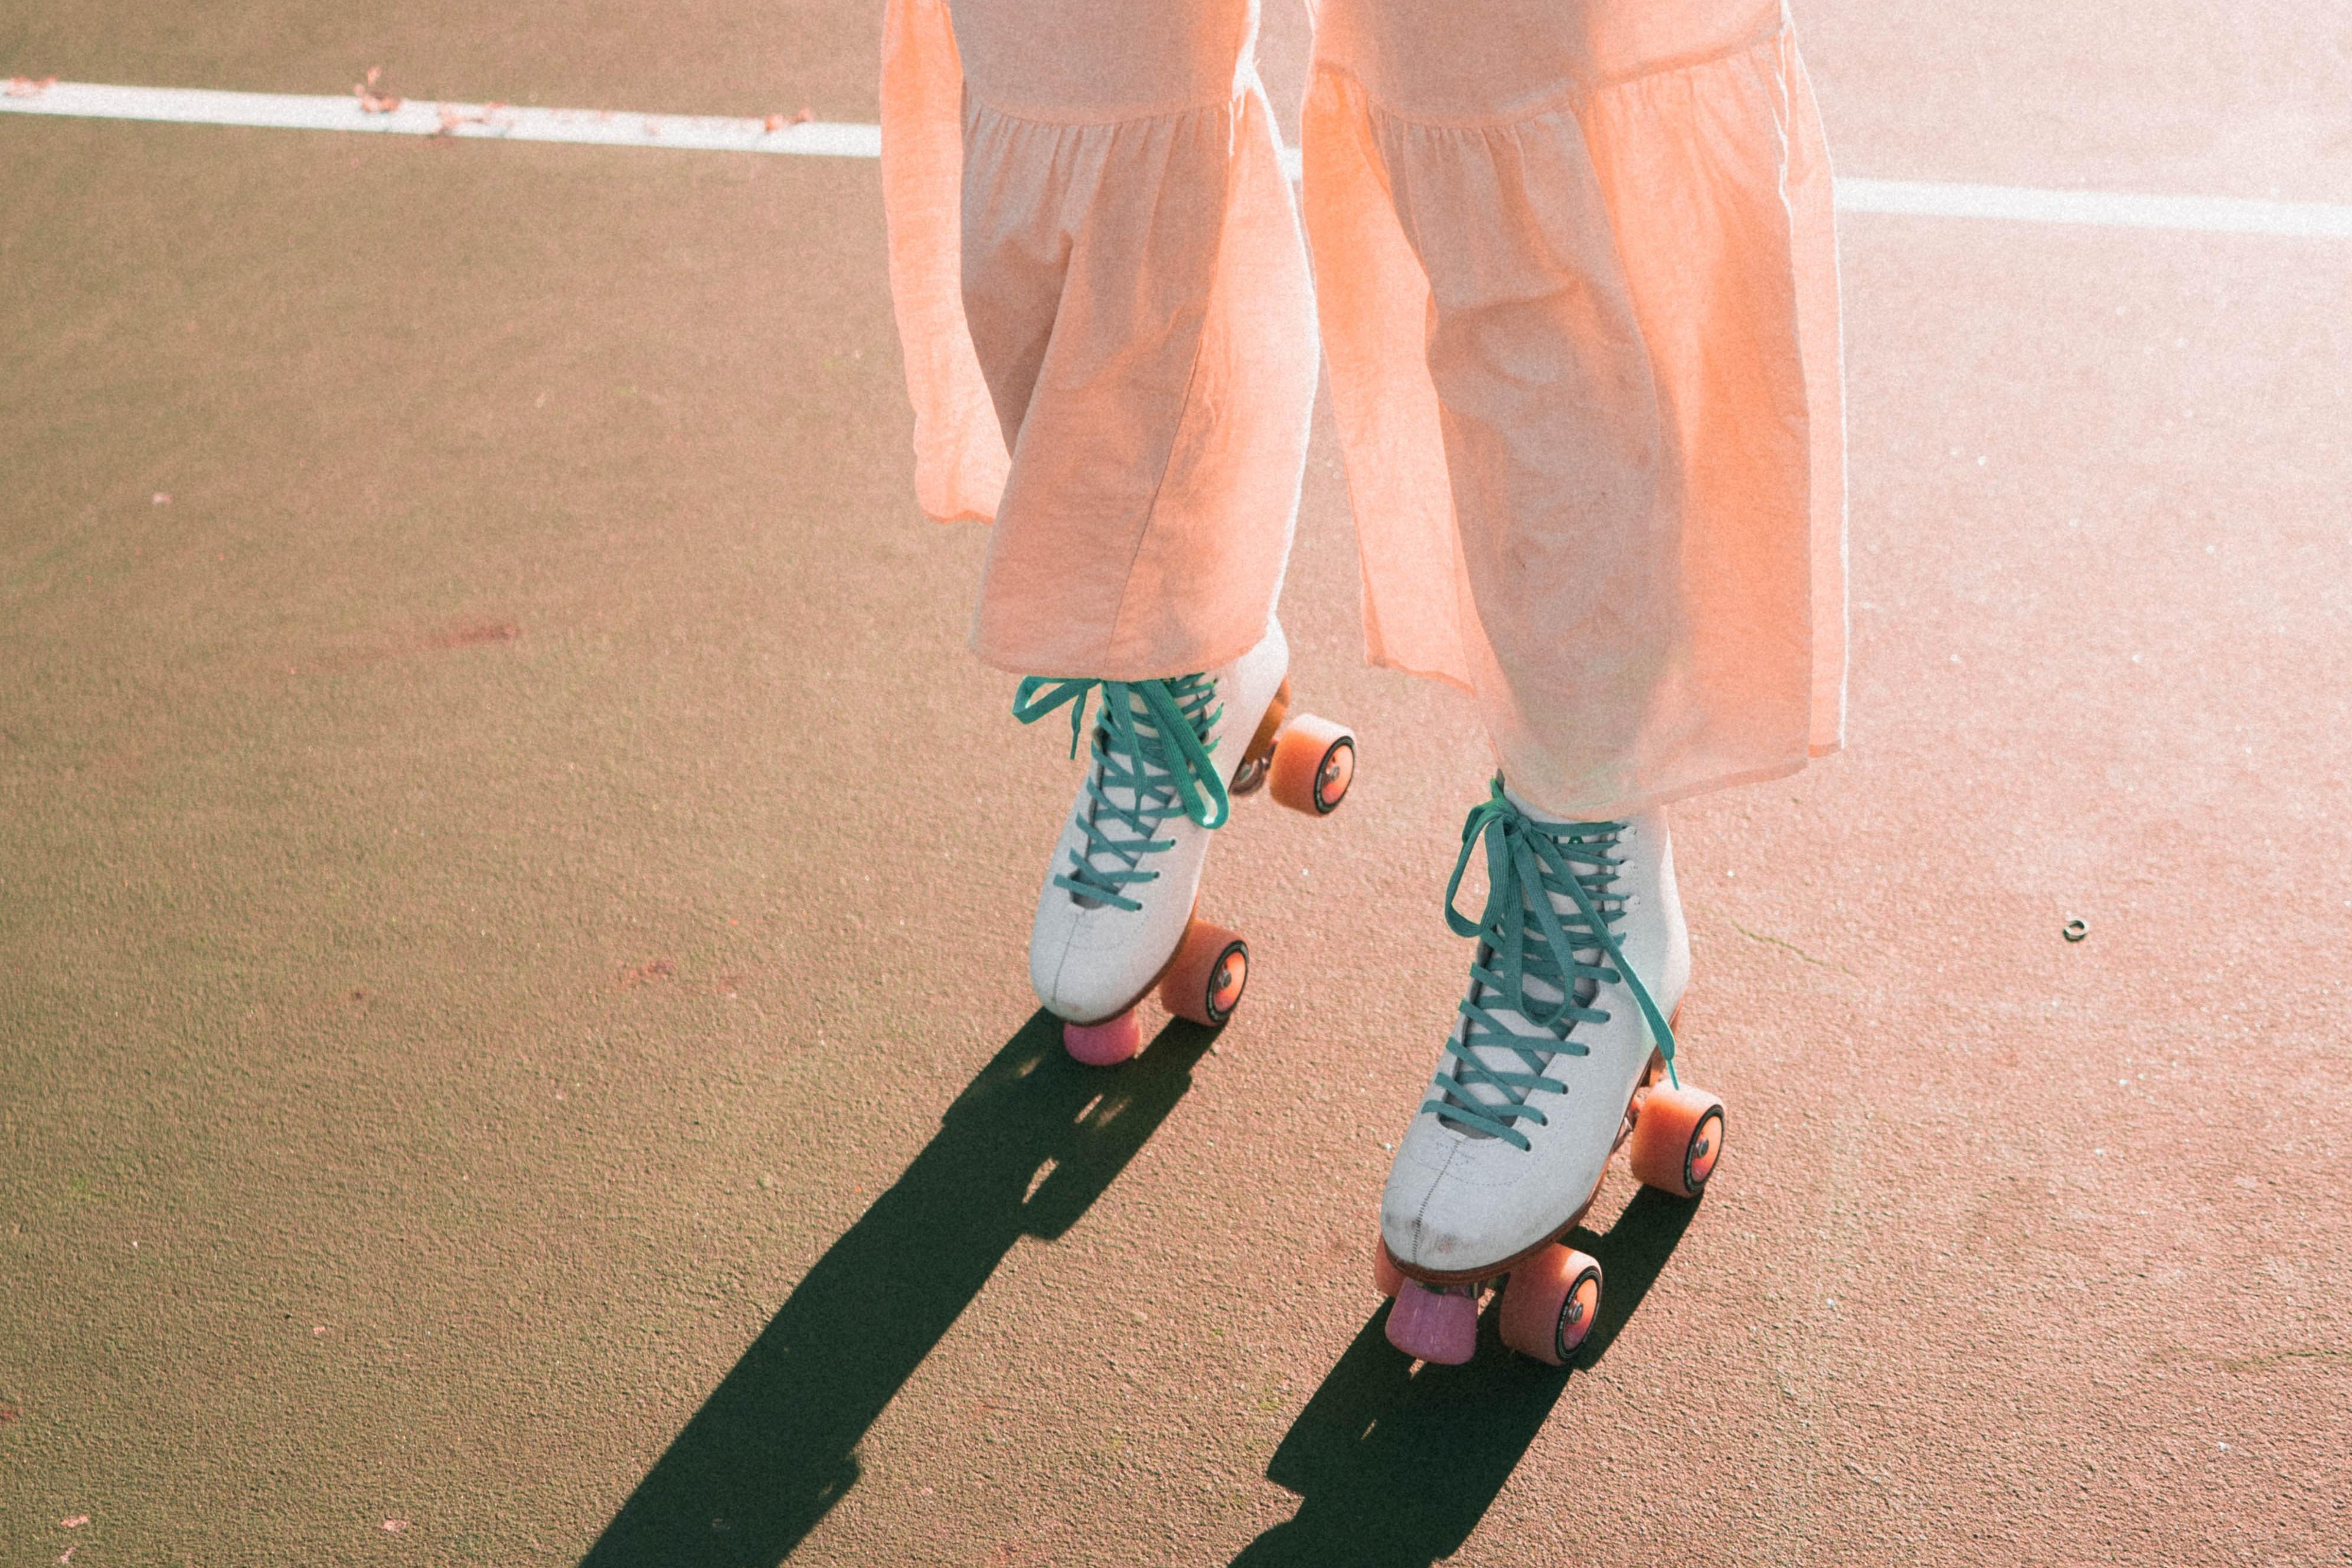 Inlineskaten Rollerskates Inliner